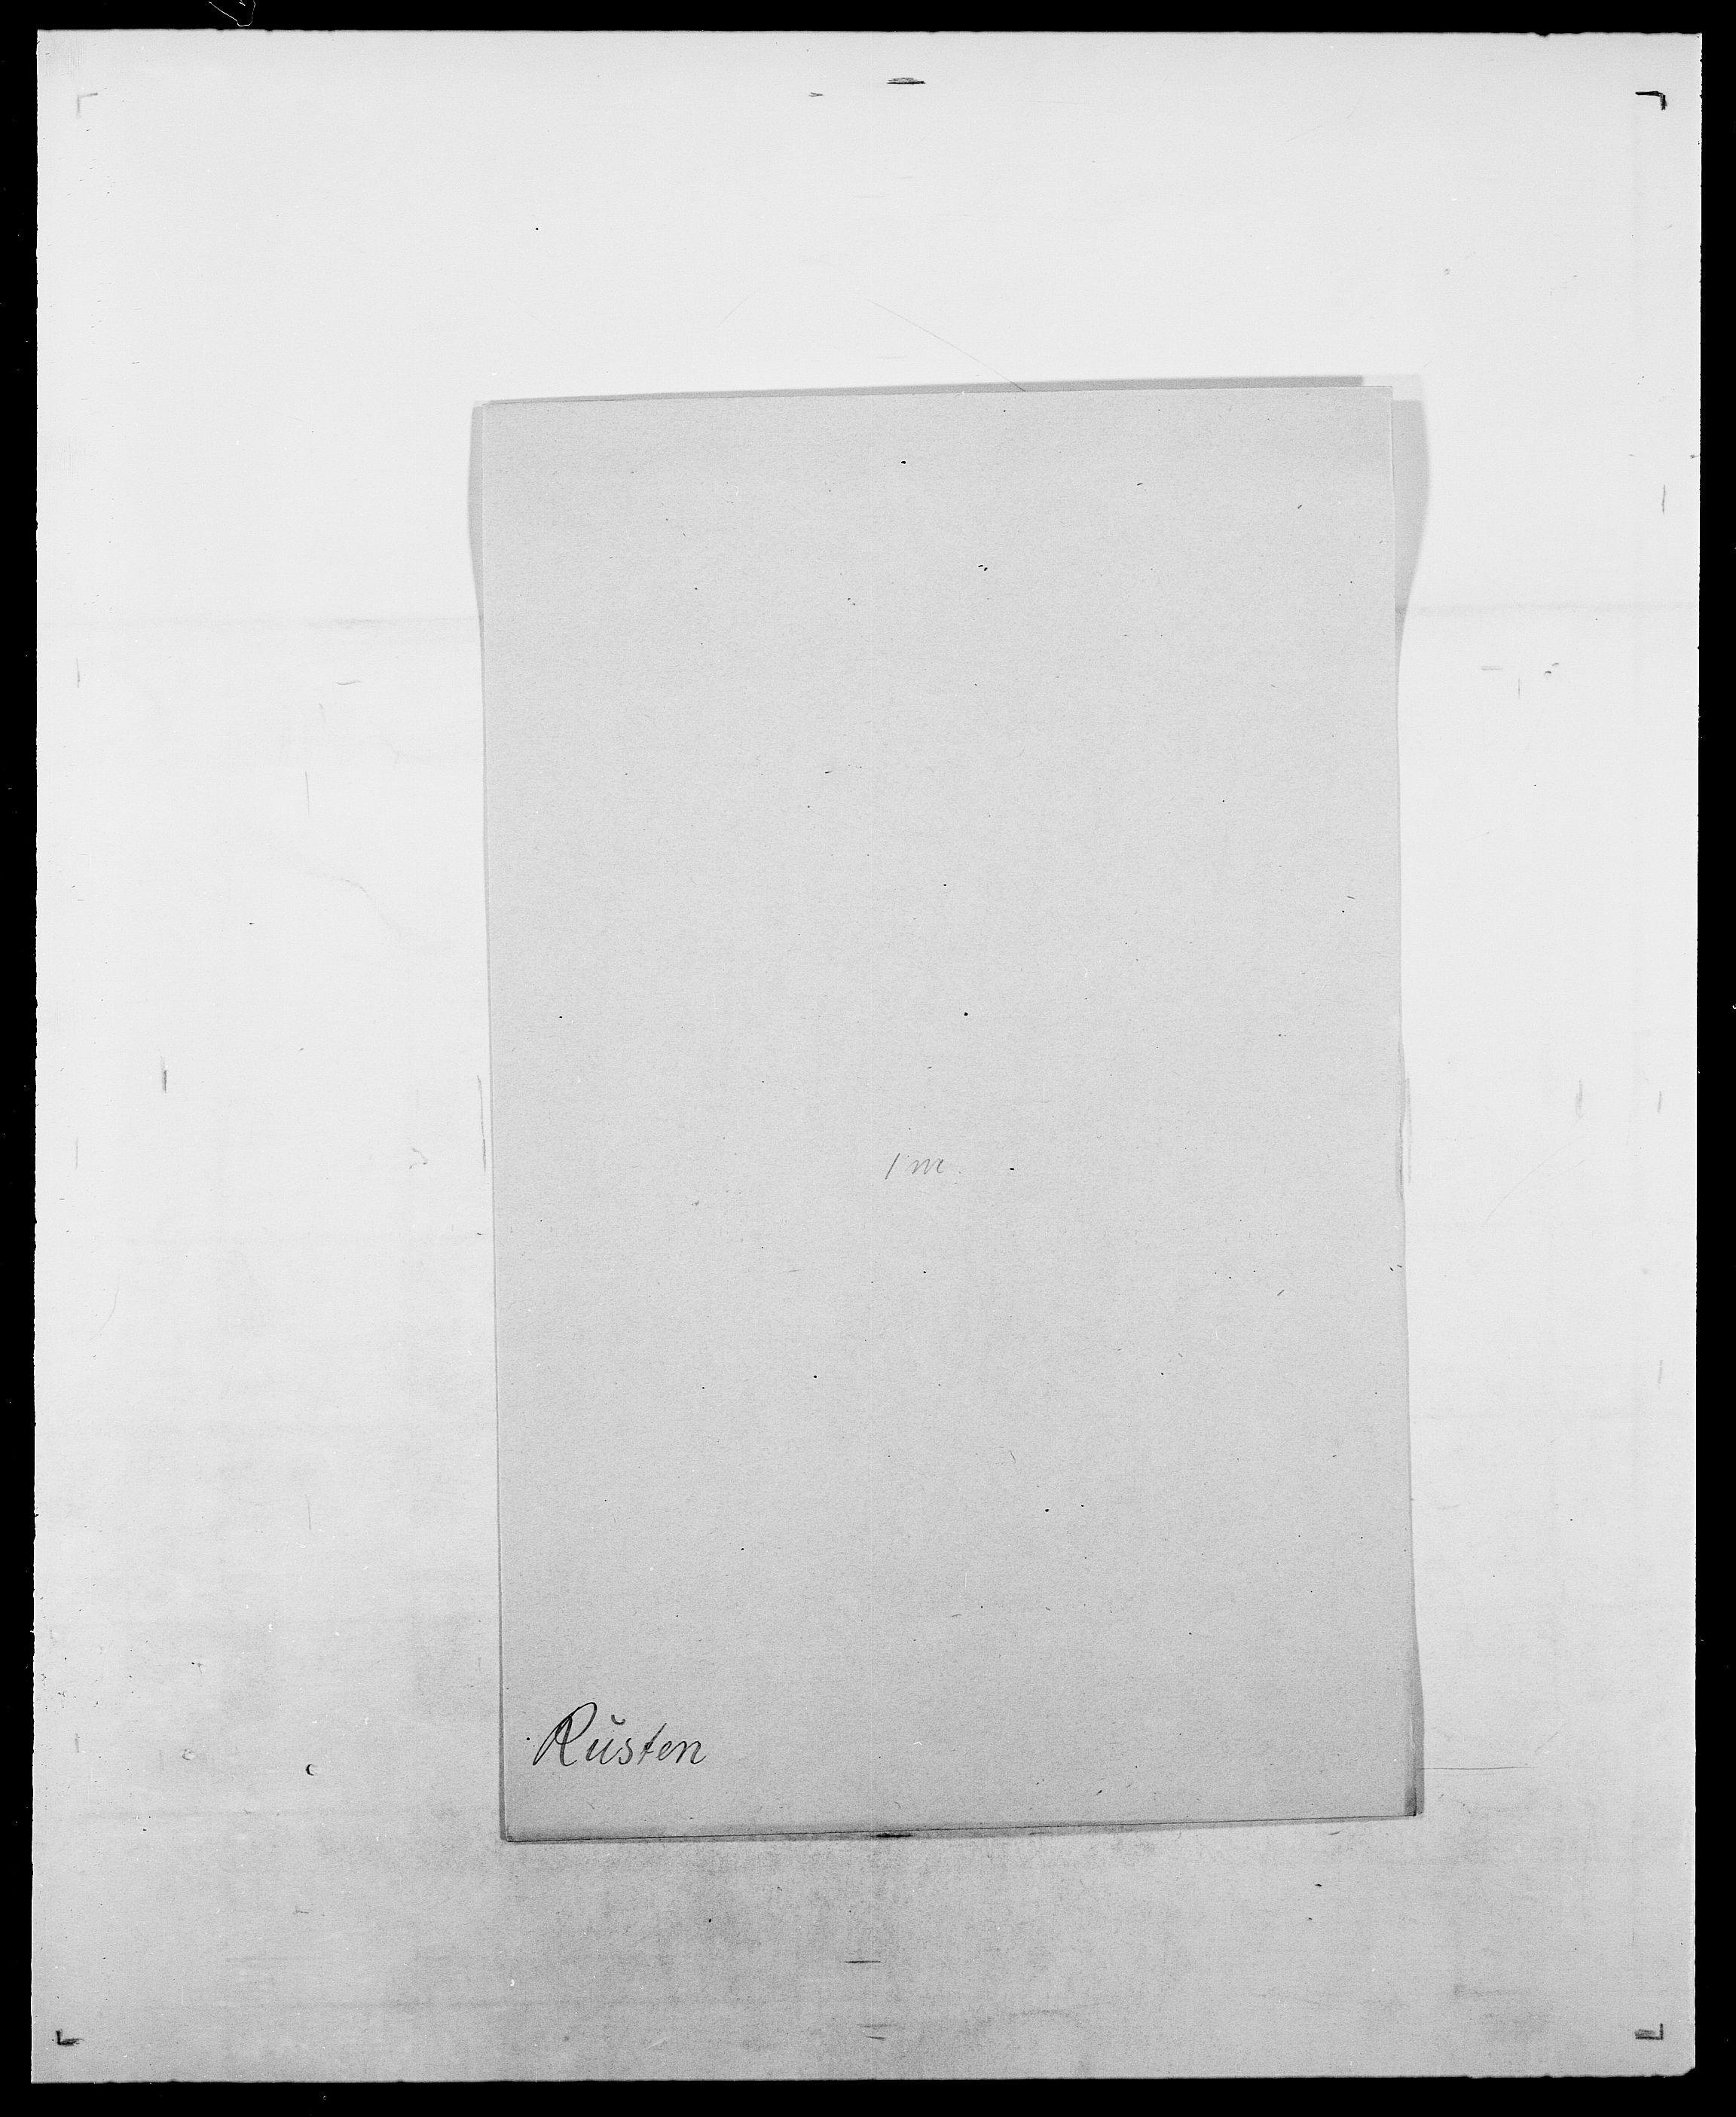 SAO, Delgobe, Charles Antoine - samling, D/Da/L0033: Roald - Røyem, s. 496